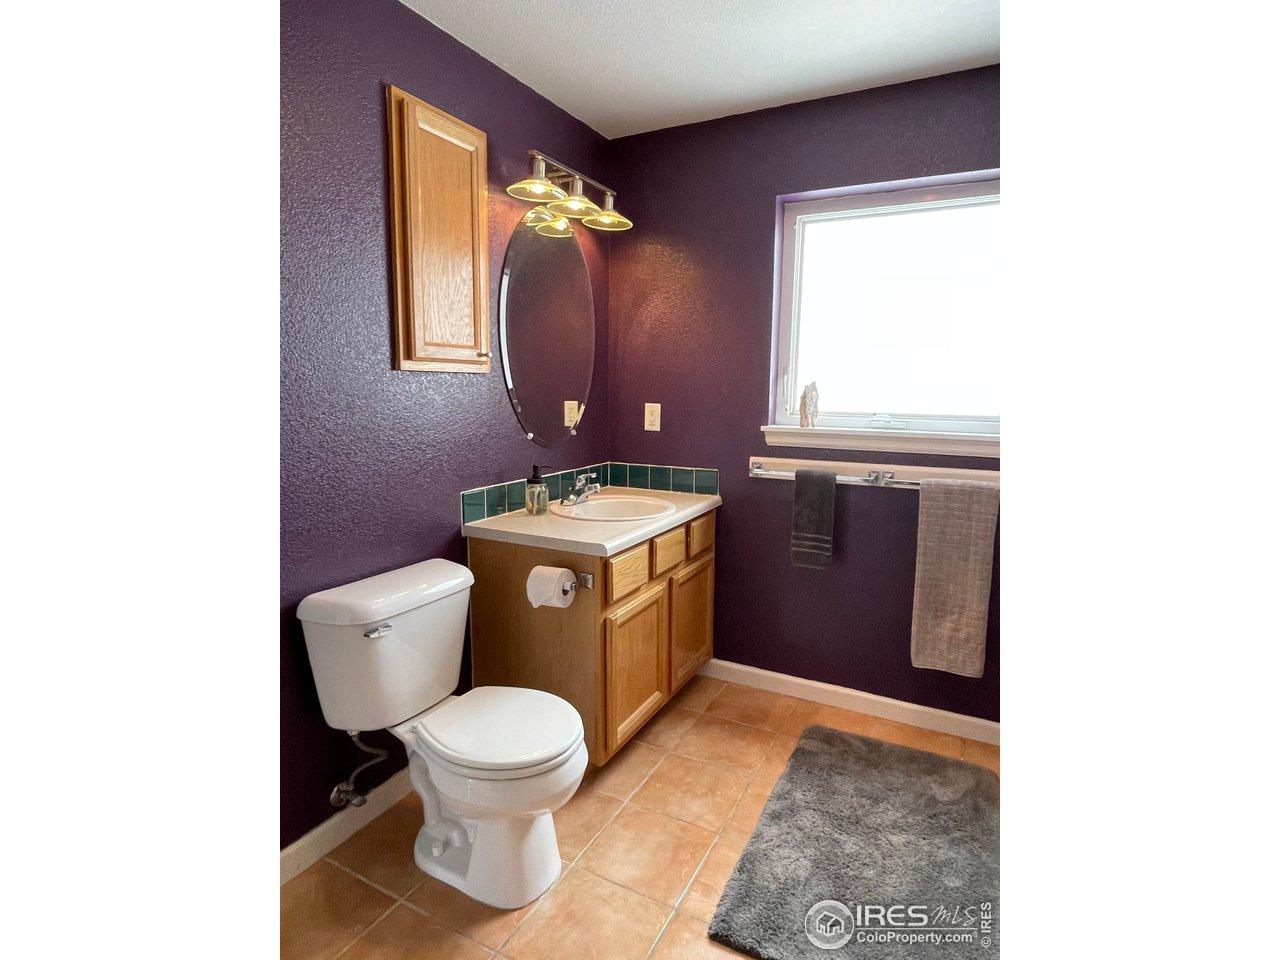 Bedroom or office FLEX space